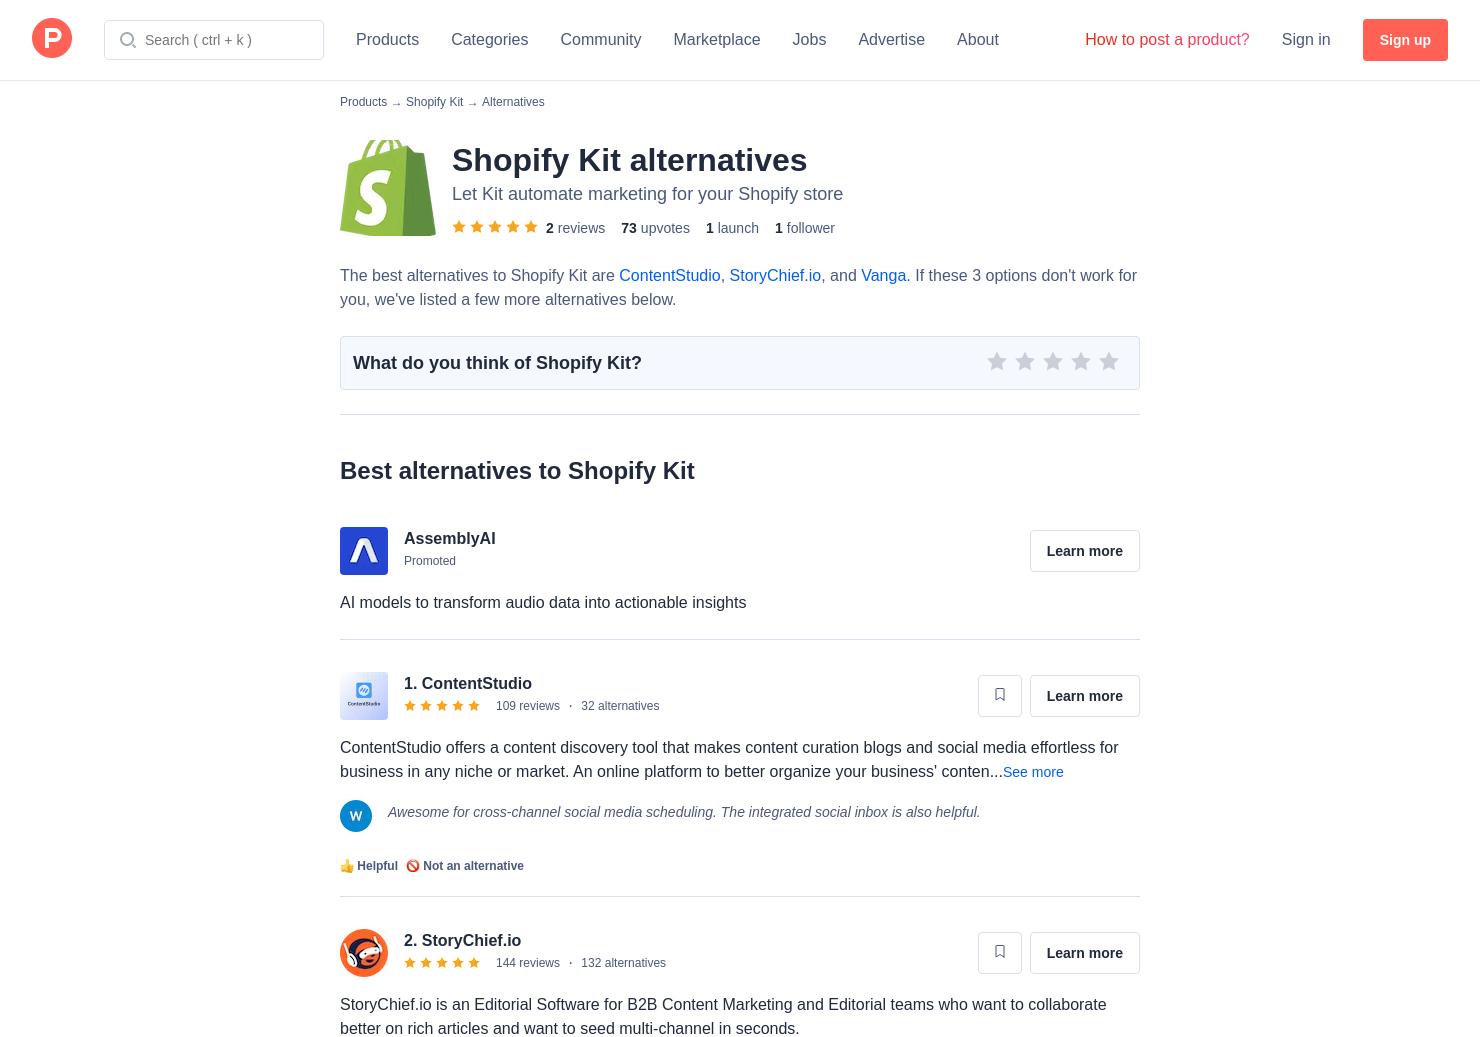 7 Alternatives to Shopify Kit   Product Hunt